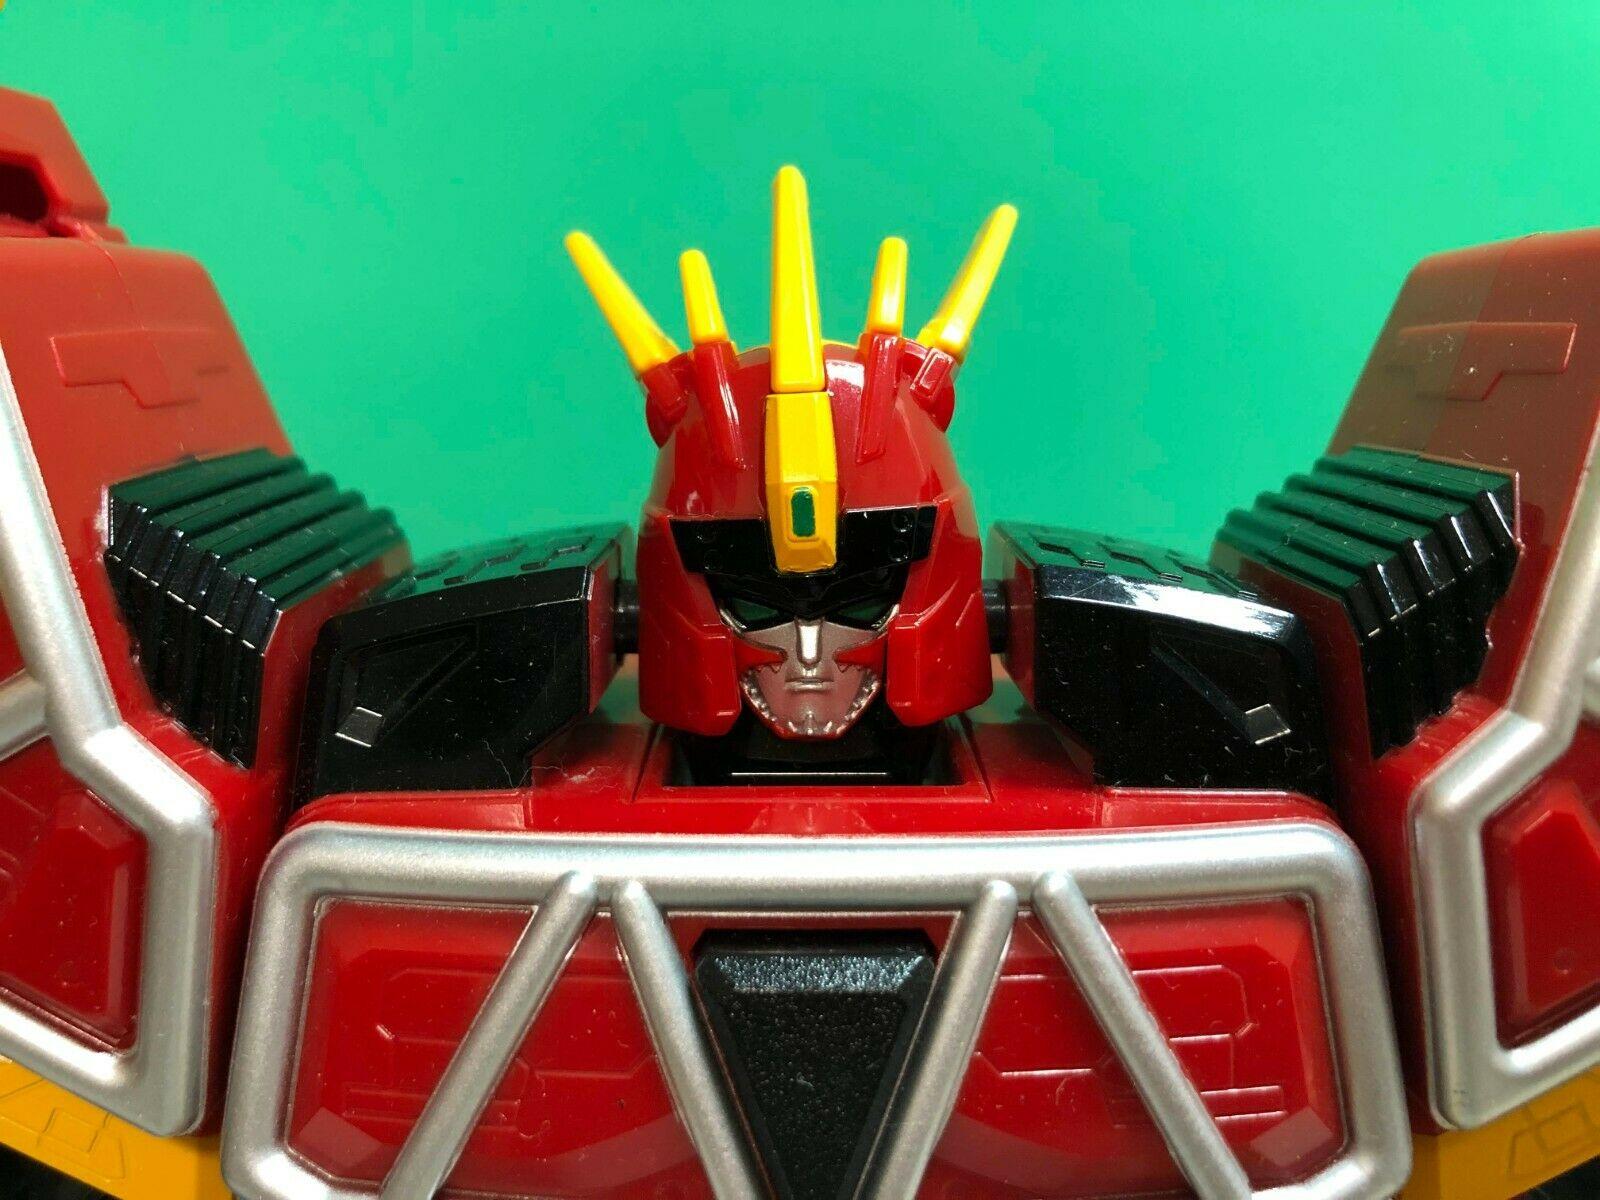 Zyuden Sentai Kyoryuger Kamitsuki Gattai DX Kyoryujin Ranger Toy 1600x1200